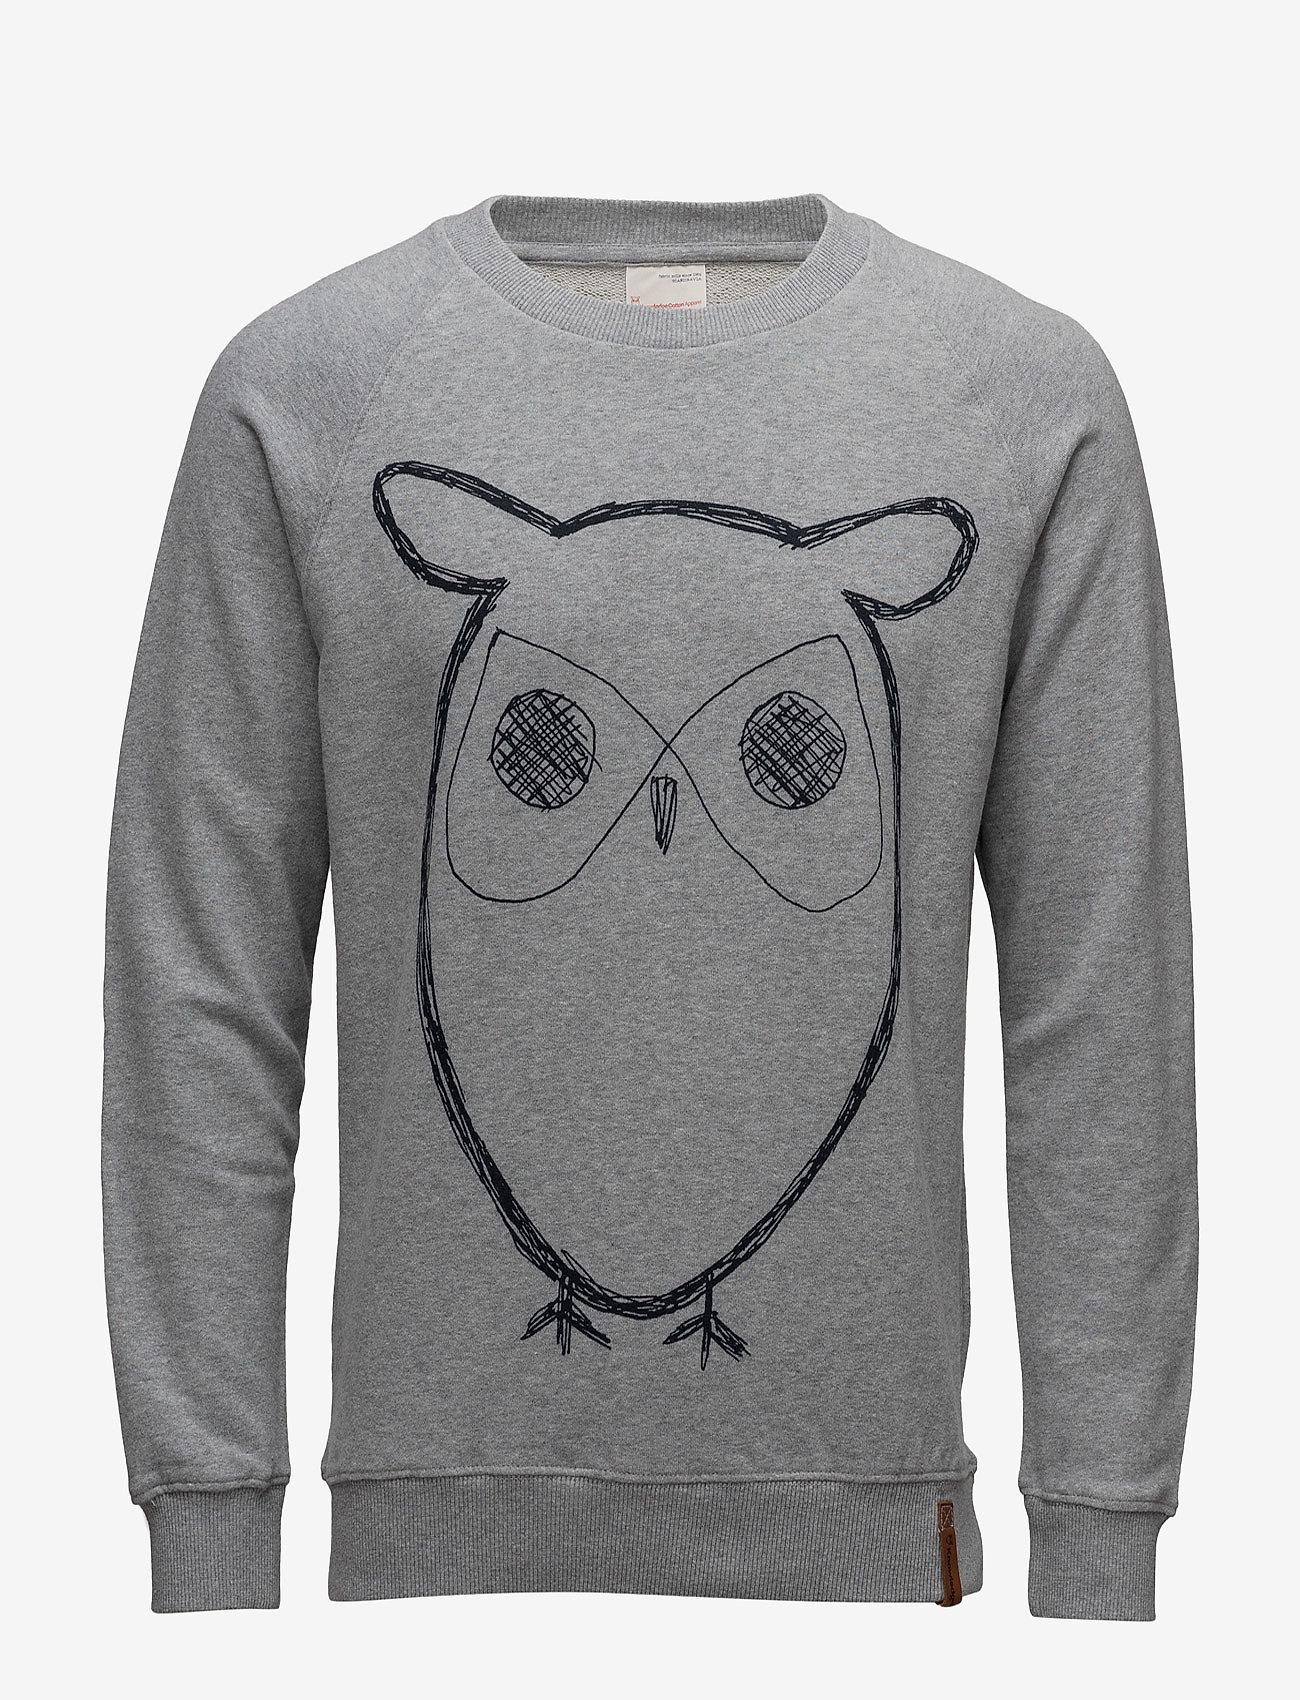 Knowledge Cotton Apparel - ELM big owl sweat - GOTS/Vegan - sweats - grey melange - 0